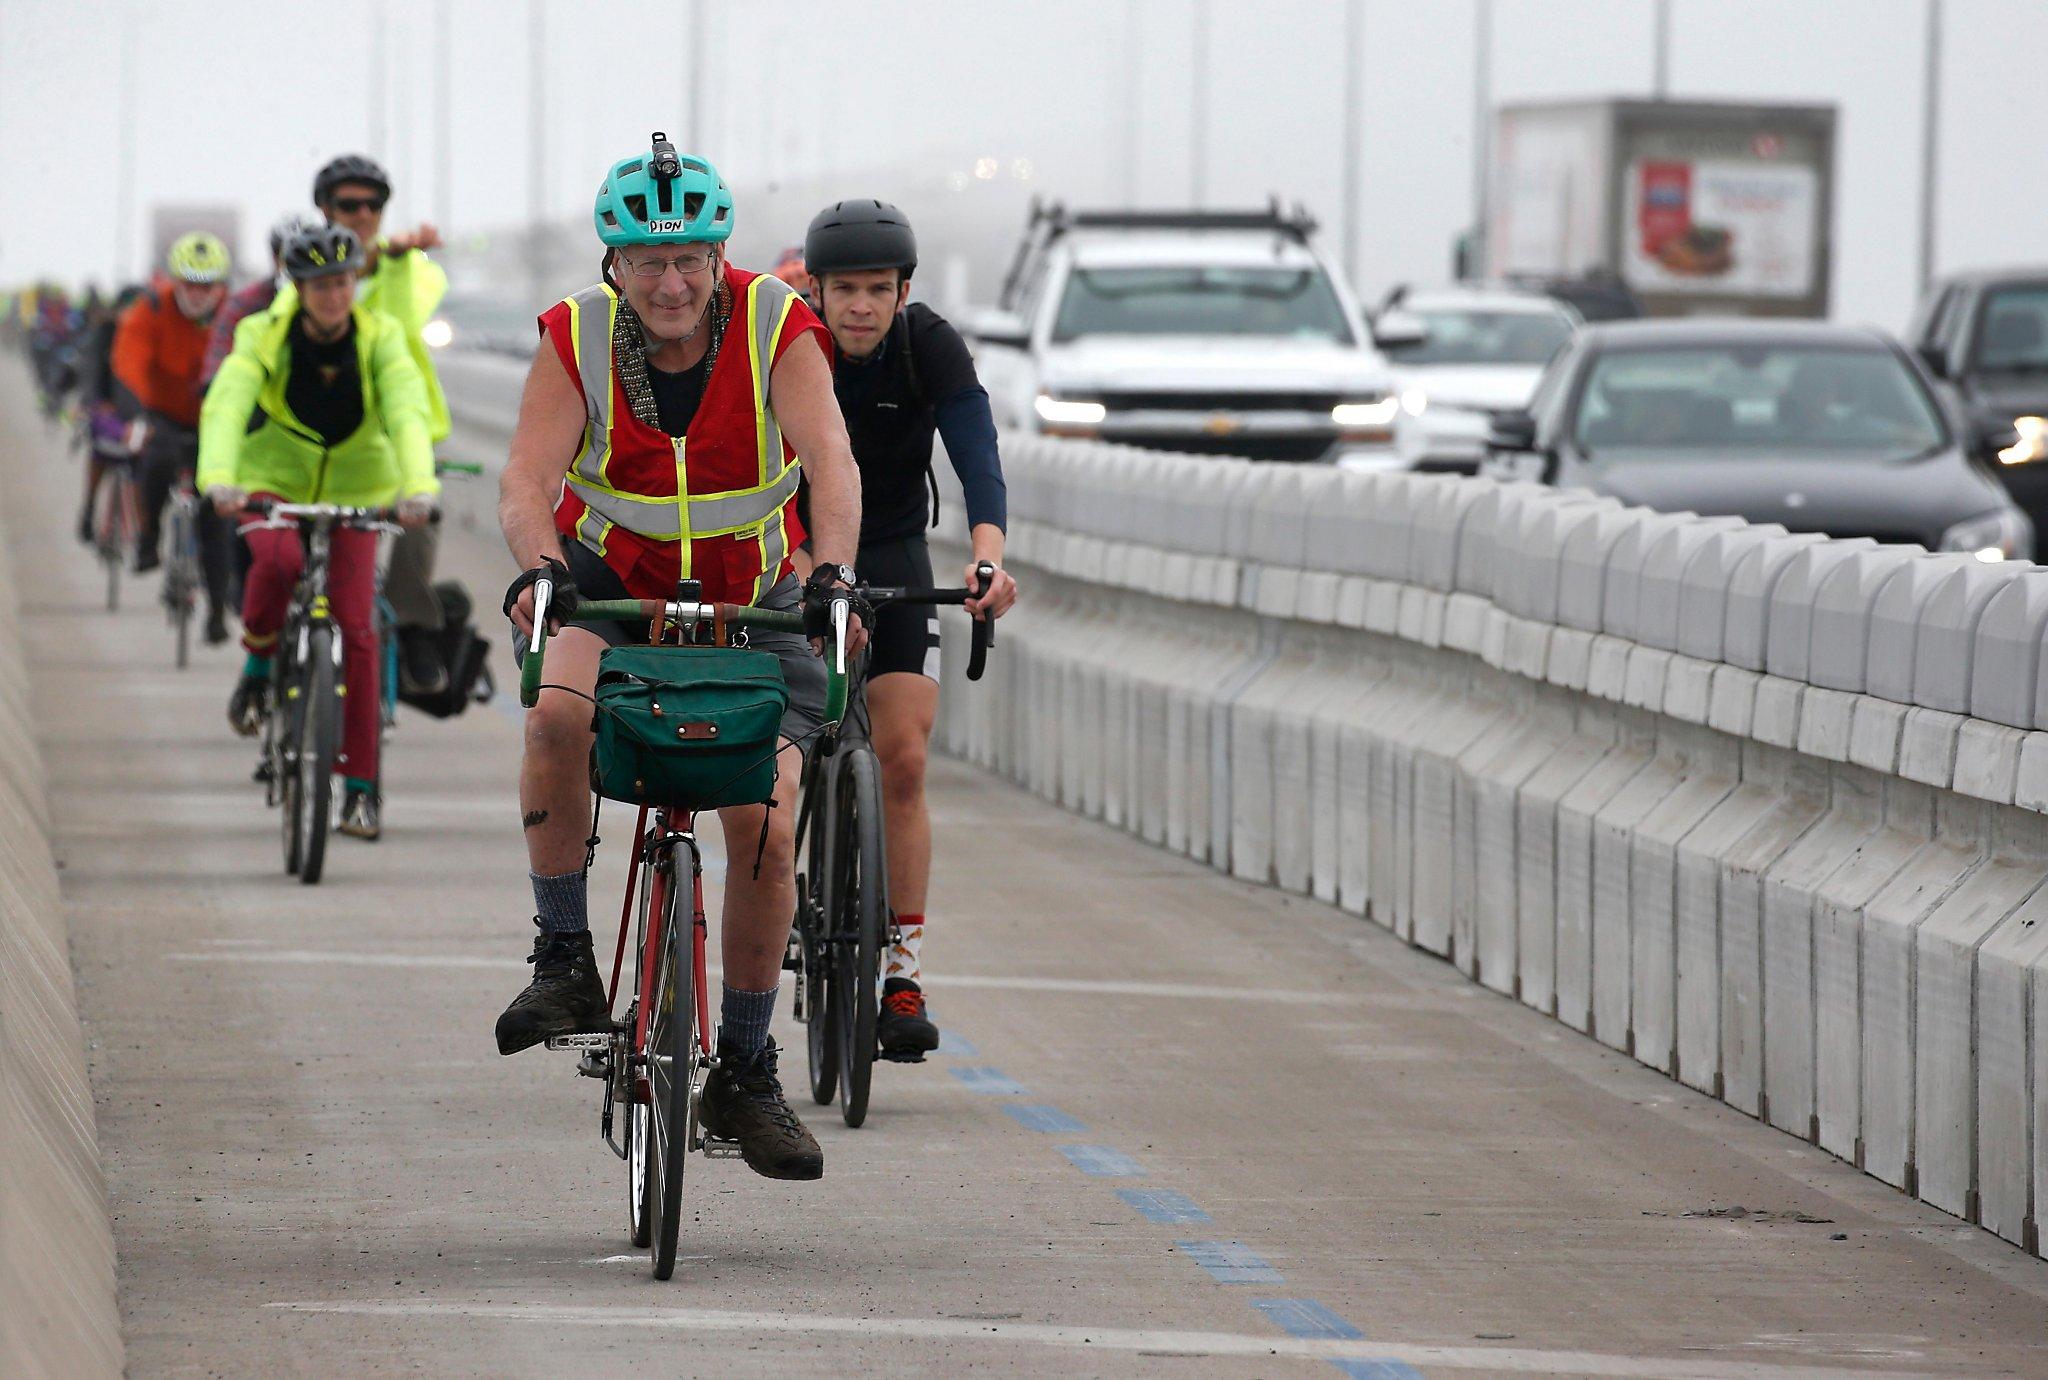 New bike path on Richmond-San Rafael Bridge leads to future of transportation - San Francisco Chronicle